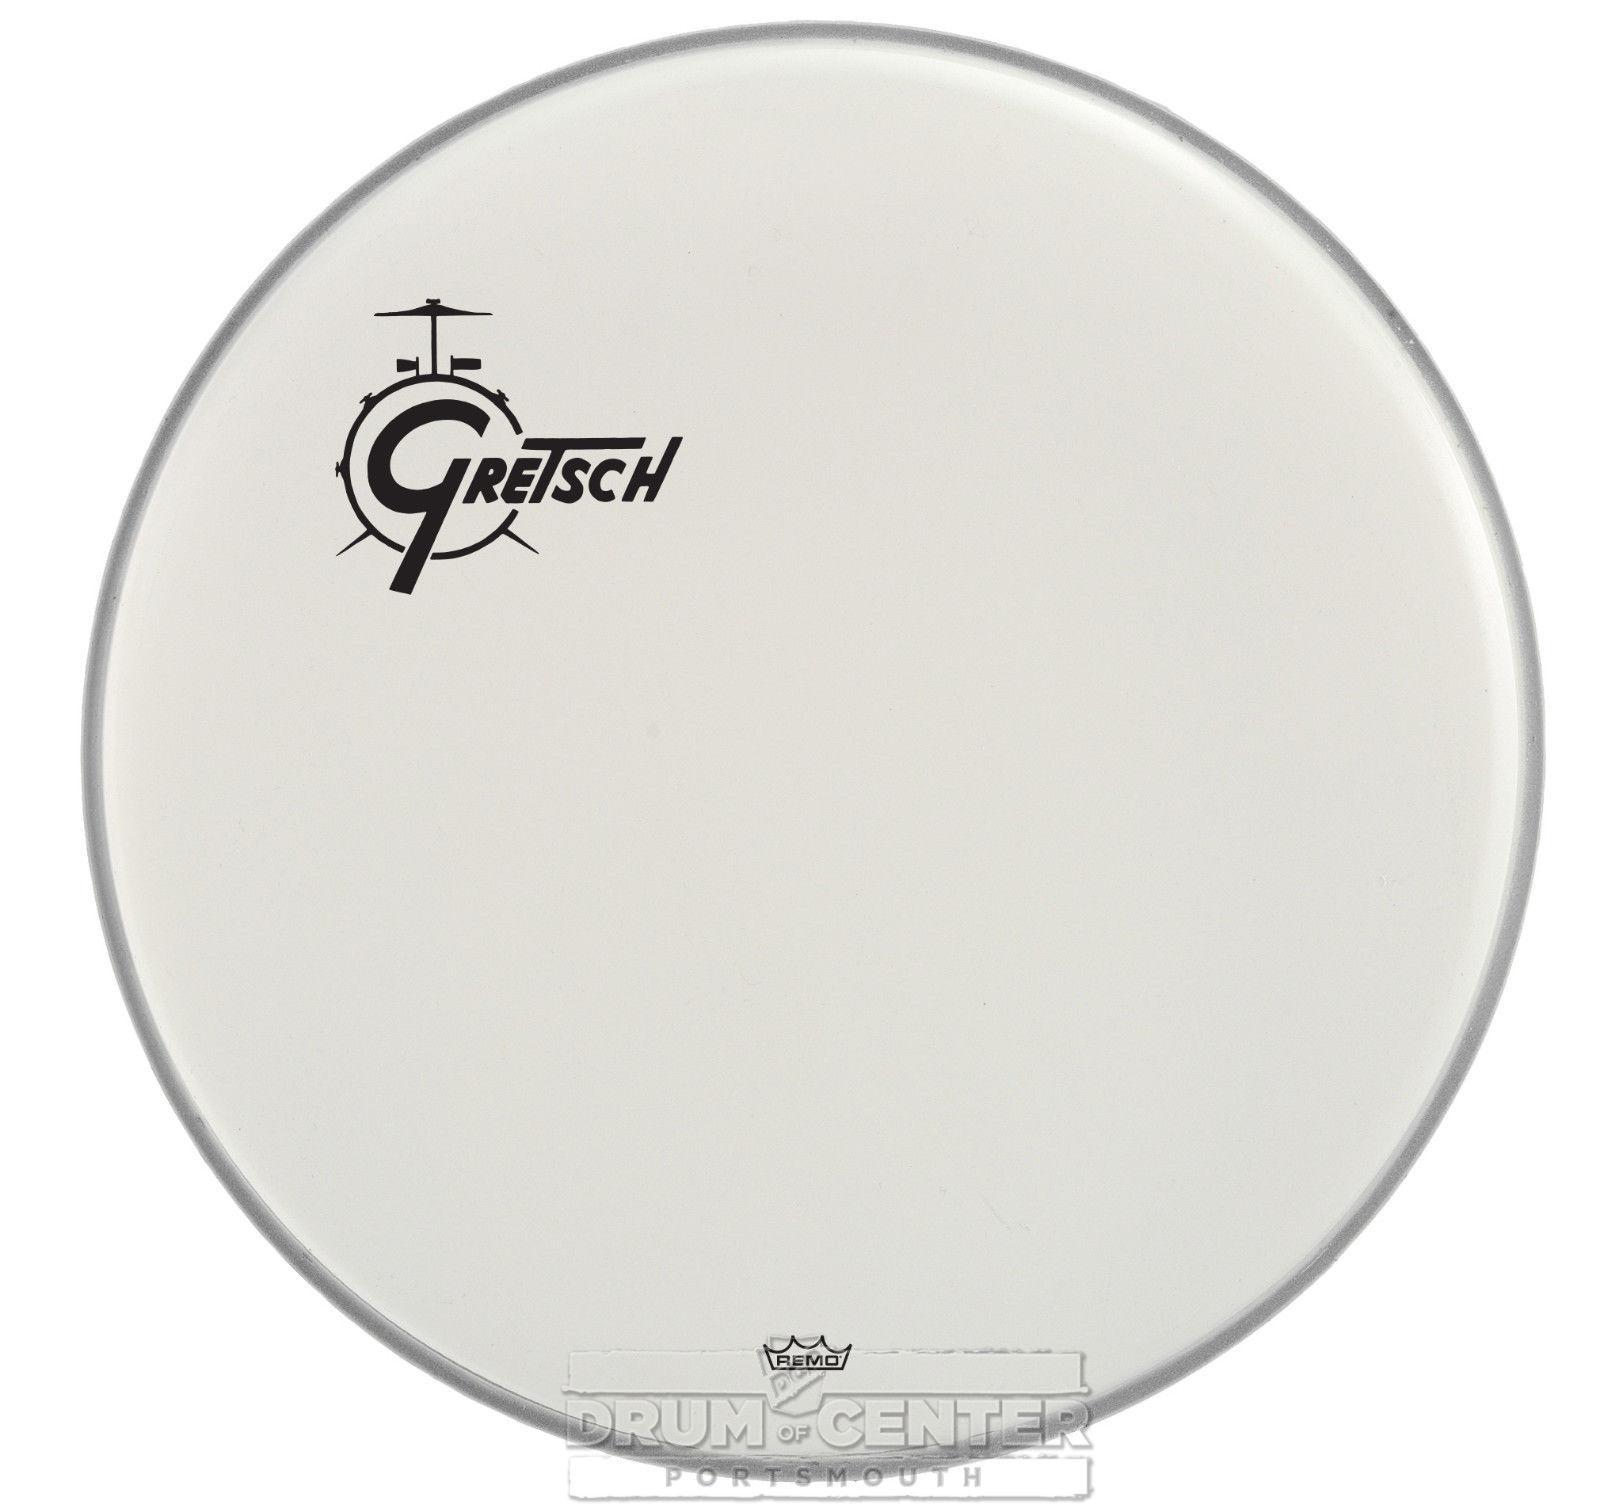 gretsch bass drum head coated 26 with offset logo grdhcw26o 19239184351 ebay. Black Bedroom Furniture Sets. Home Design Ideas